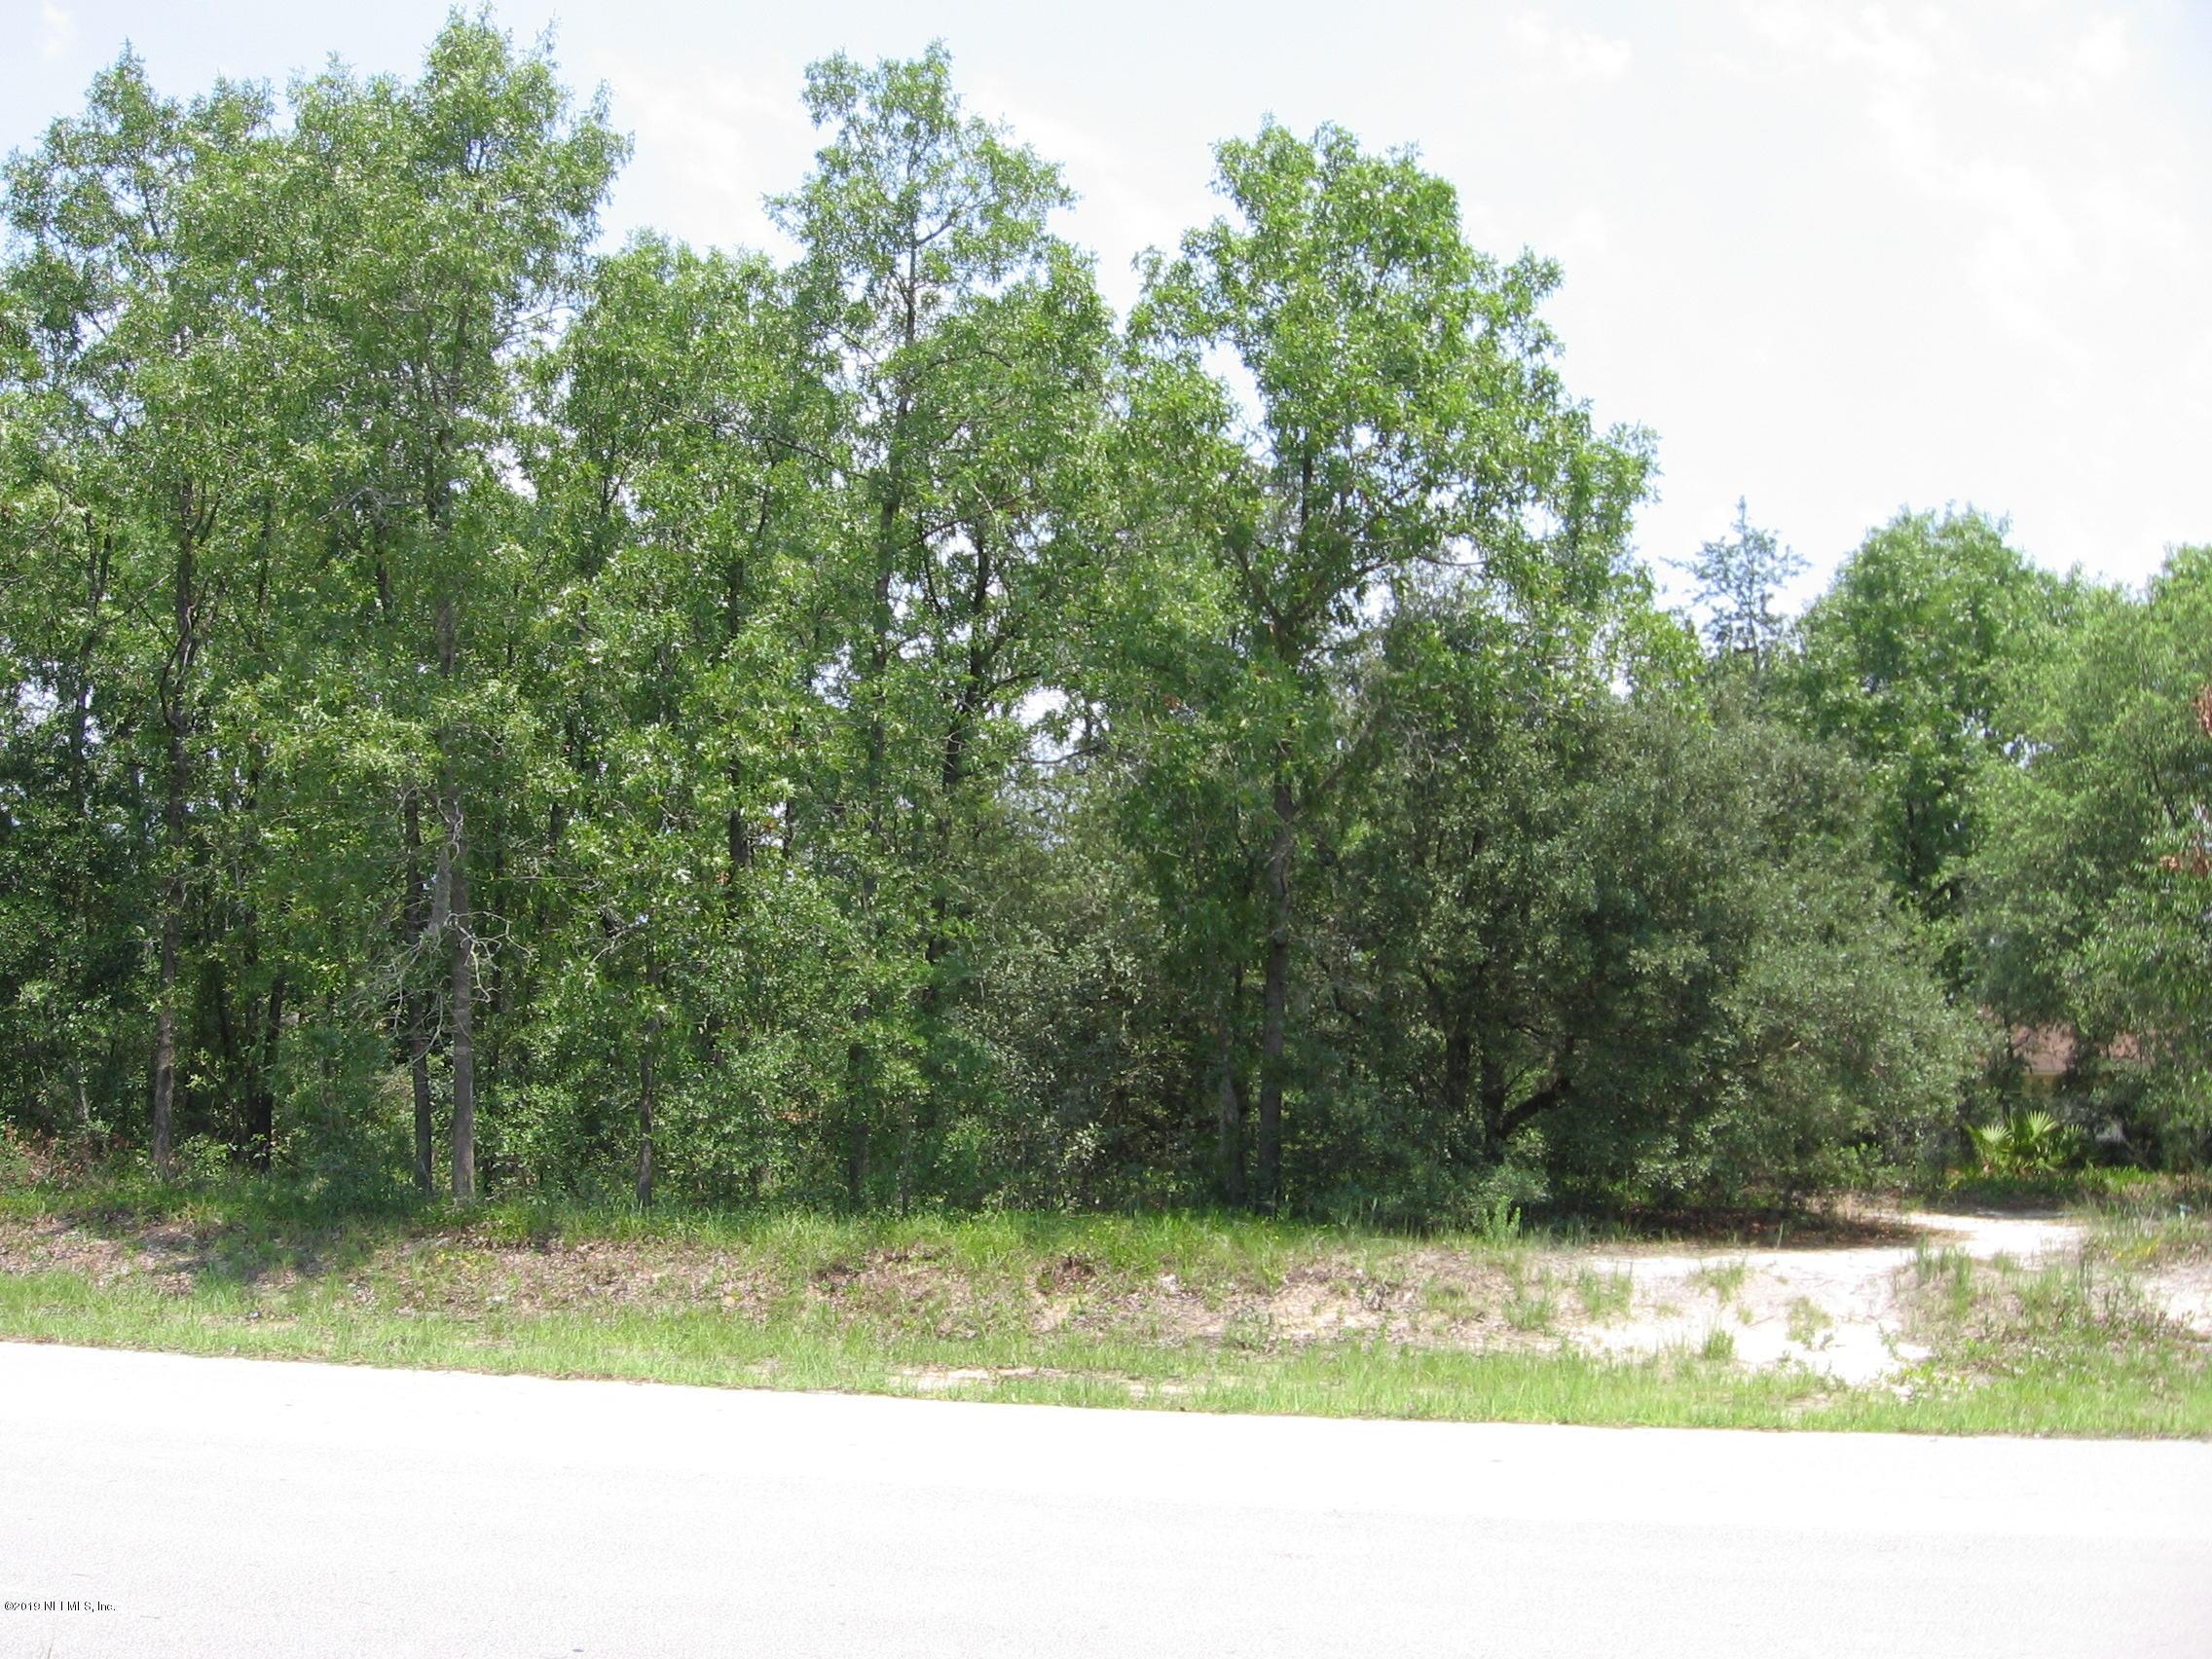 132 LAKE GALILEE - PLUS 33 LOTS, HAWTHORNE, FLORIDA 32640, ,Vacant land,For sale,LAKE GALILEE - PLUS 33 LOTS,1030813